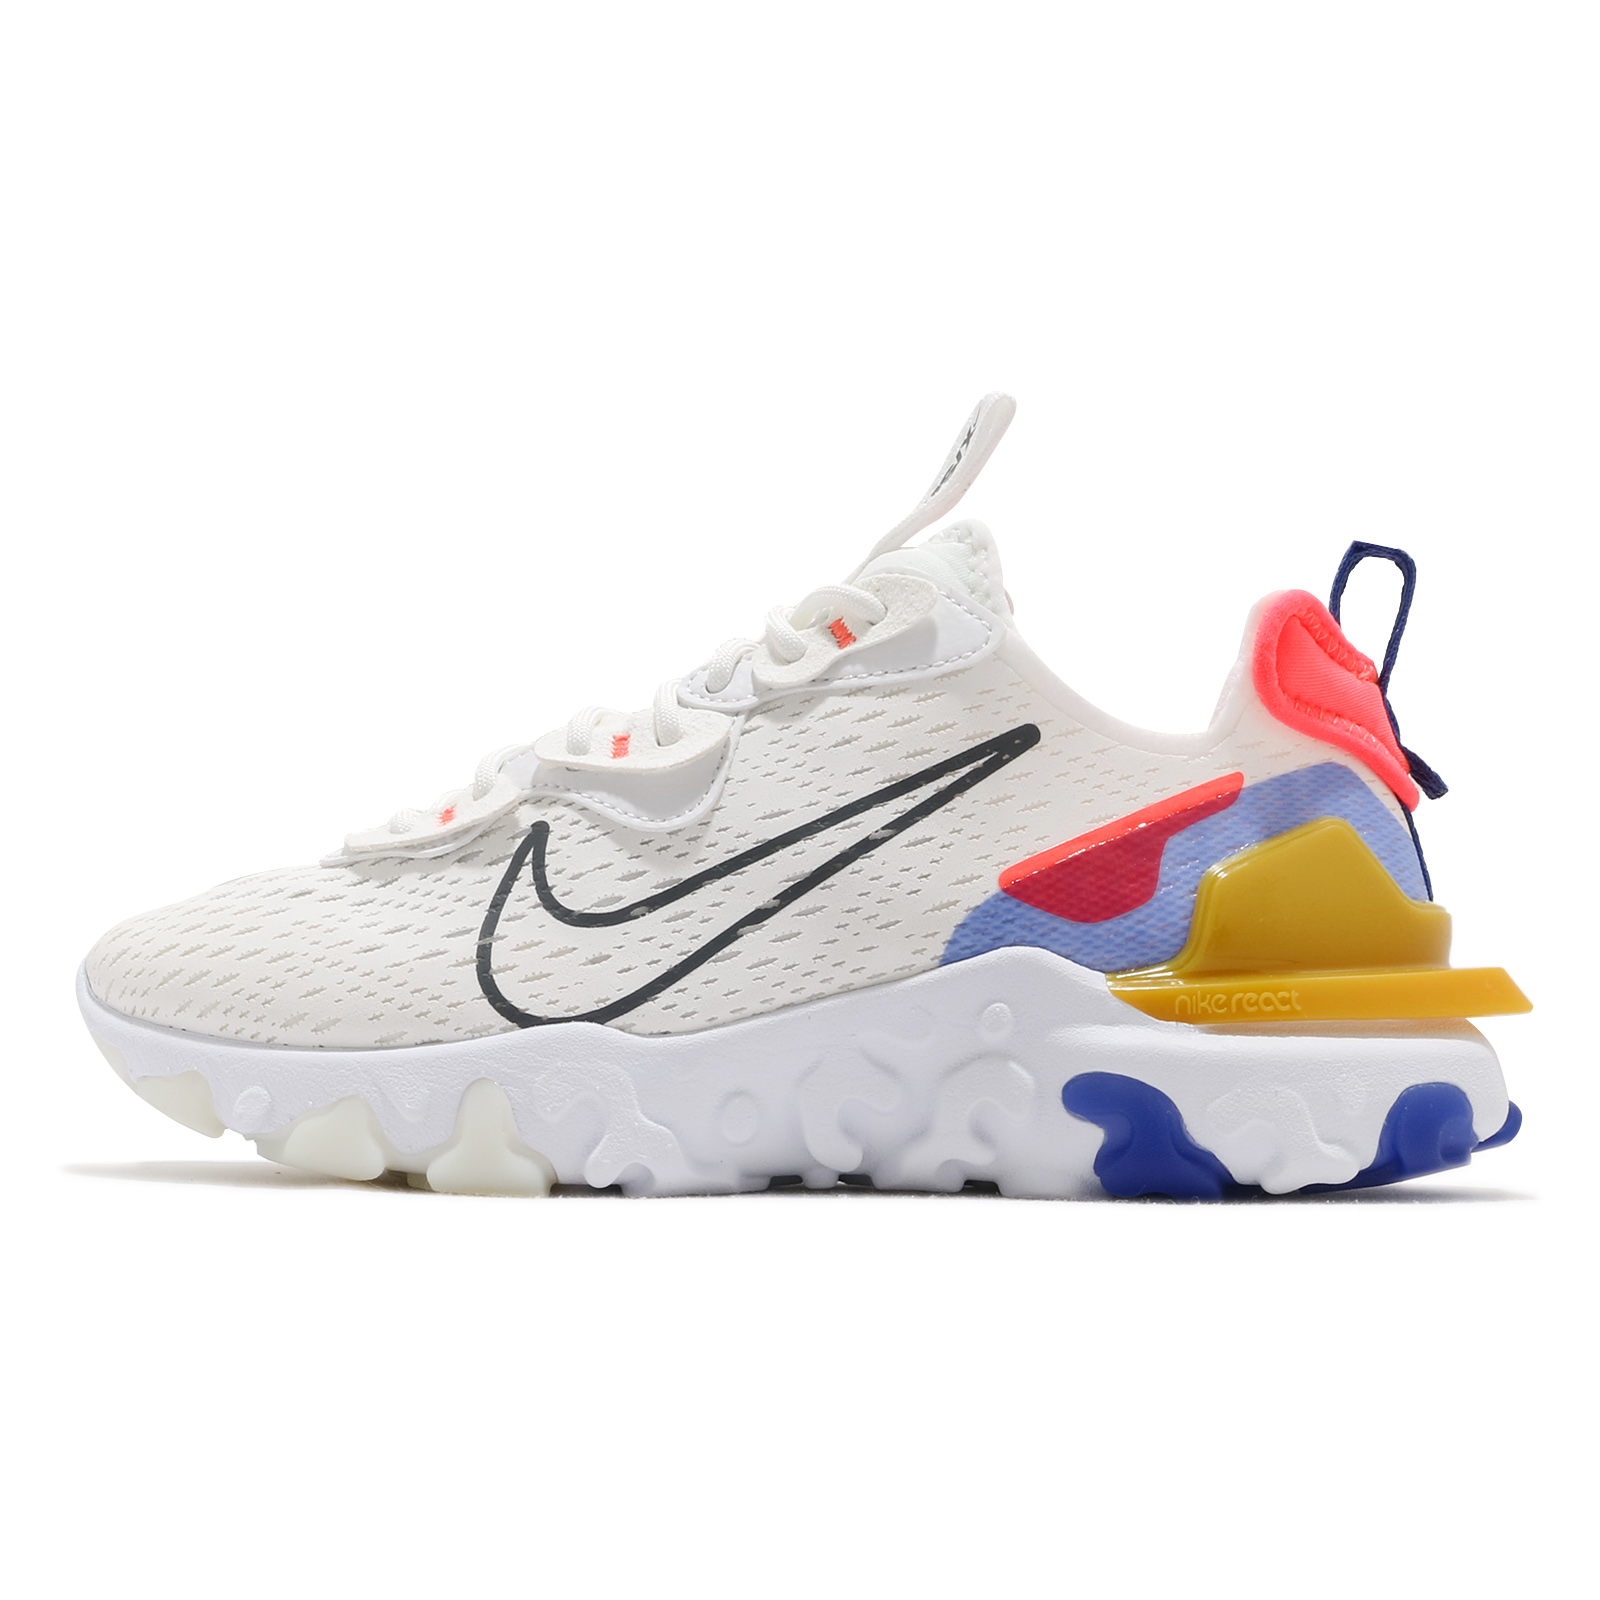 Nike 慢跑鞋 React Vision 灰 橘 藍 桃紅 女鞋 回彈中底 運動鞋 【ACS】 CI7523-101